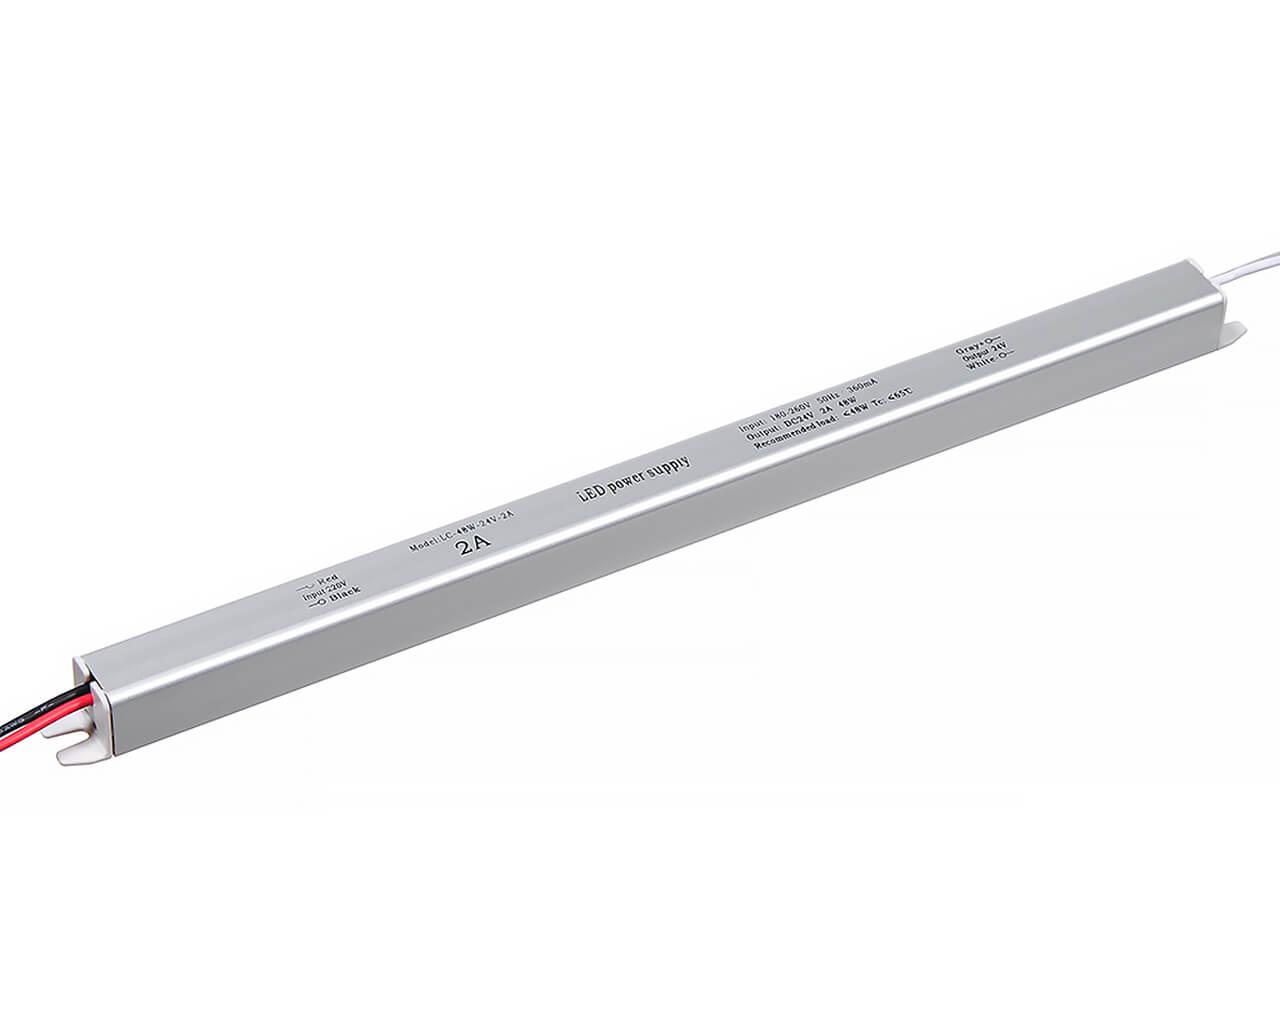 Блок питания LC-K50W-24V 2А (карандаш 312*18*18)